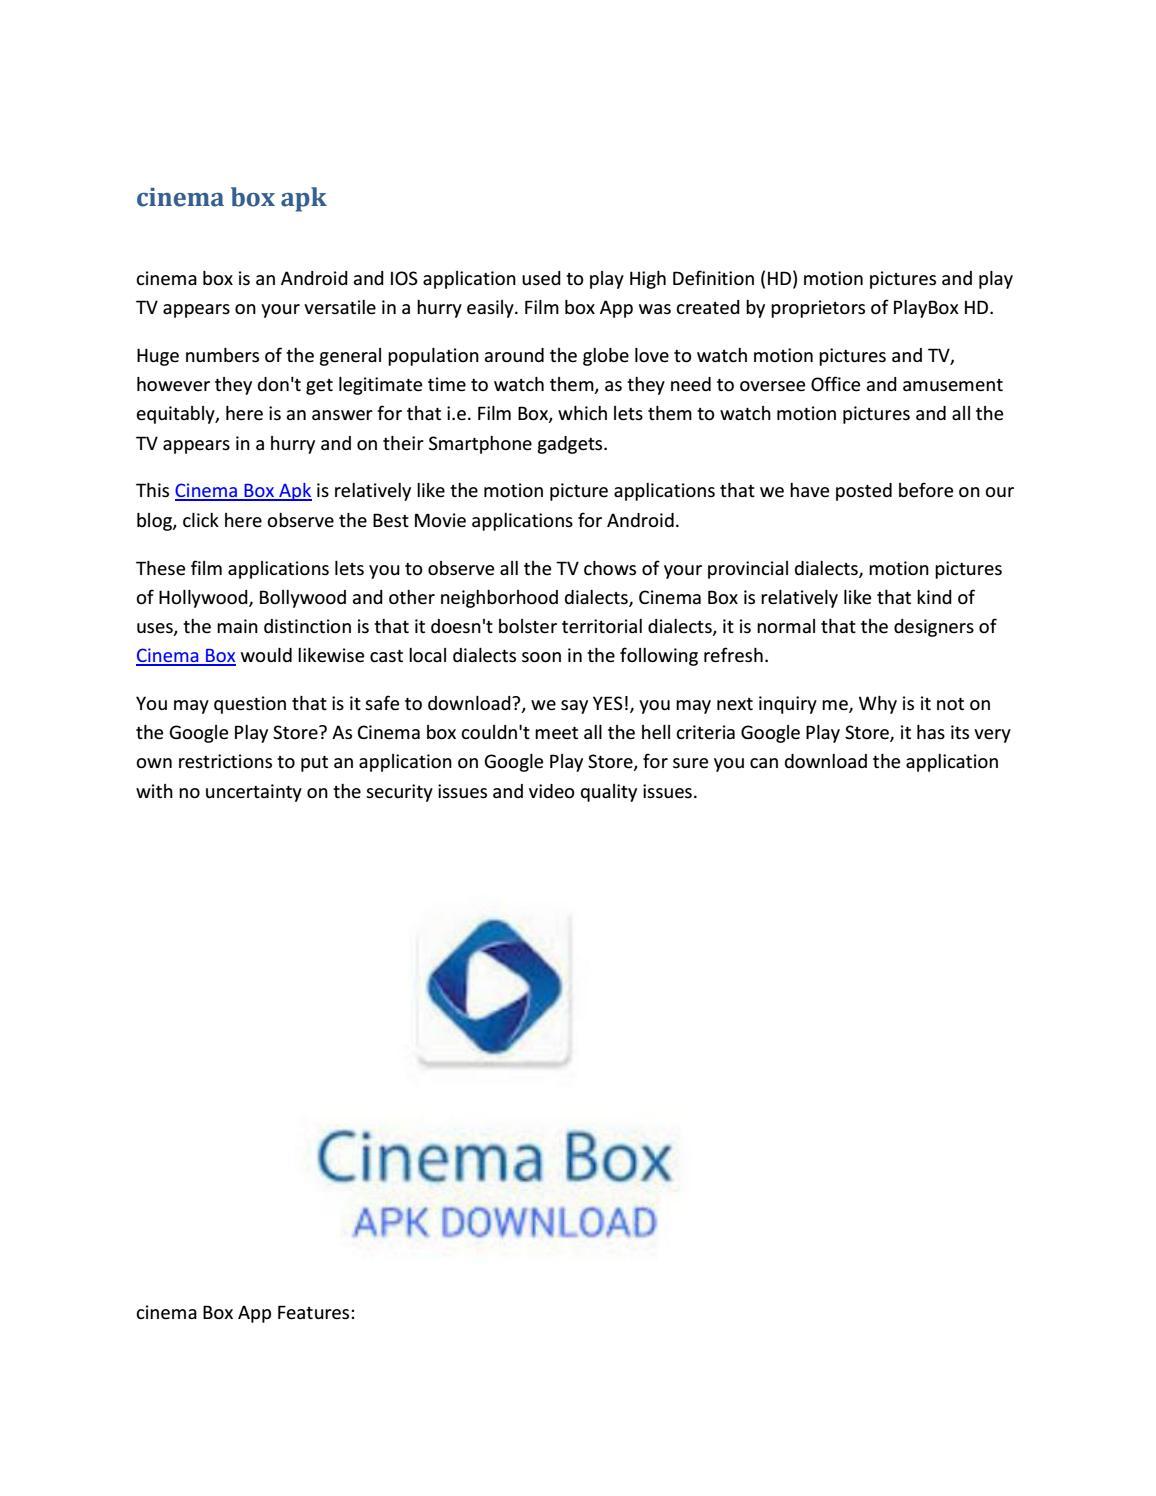 cinema box movie app